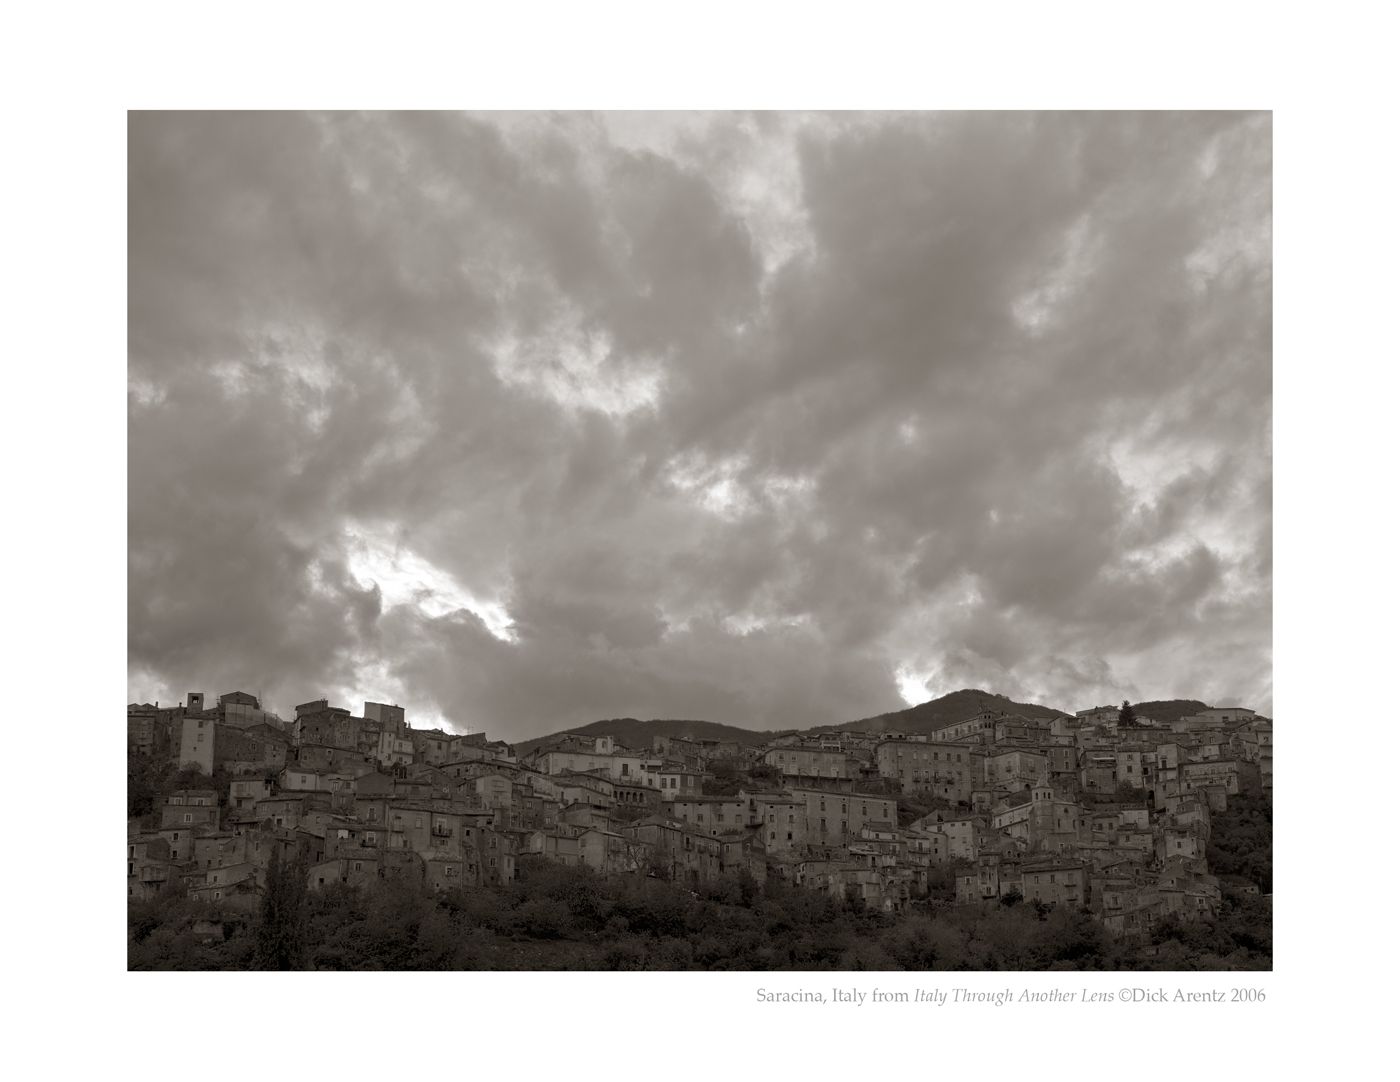 Saracina, Italy - Italy Through Another Lens